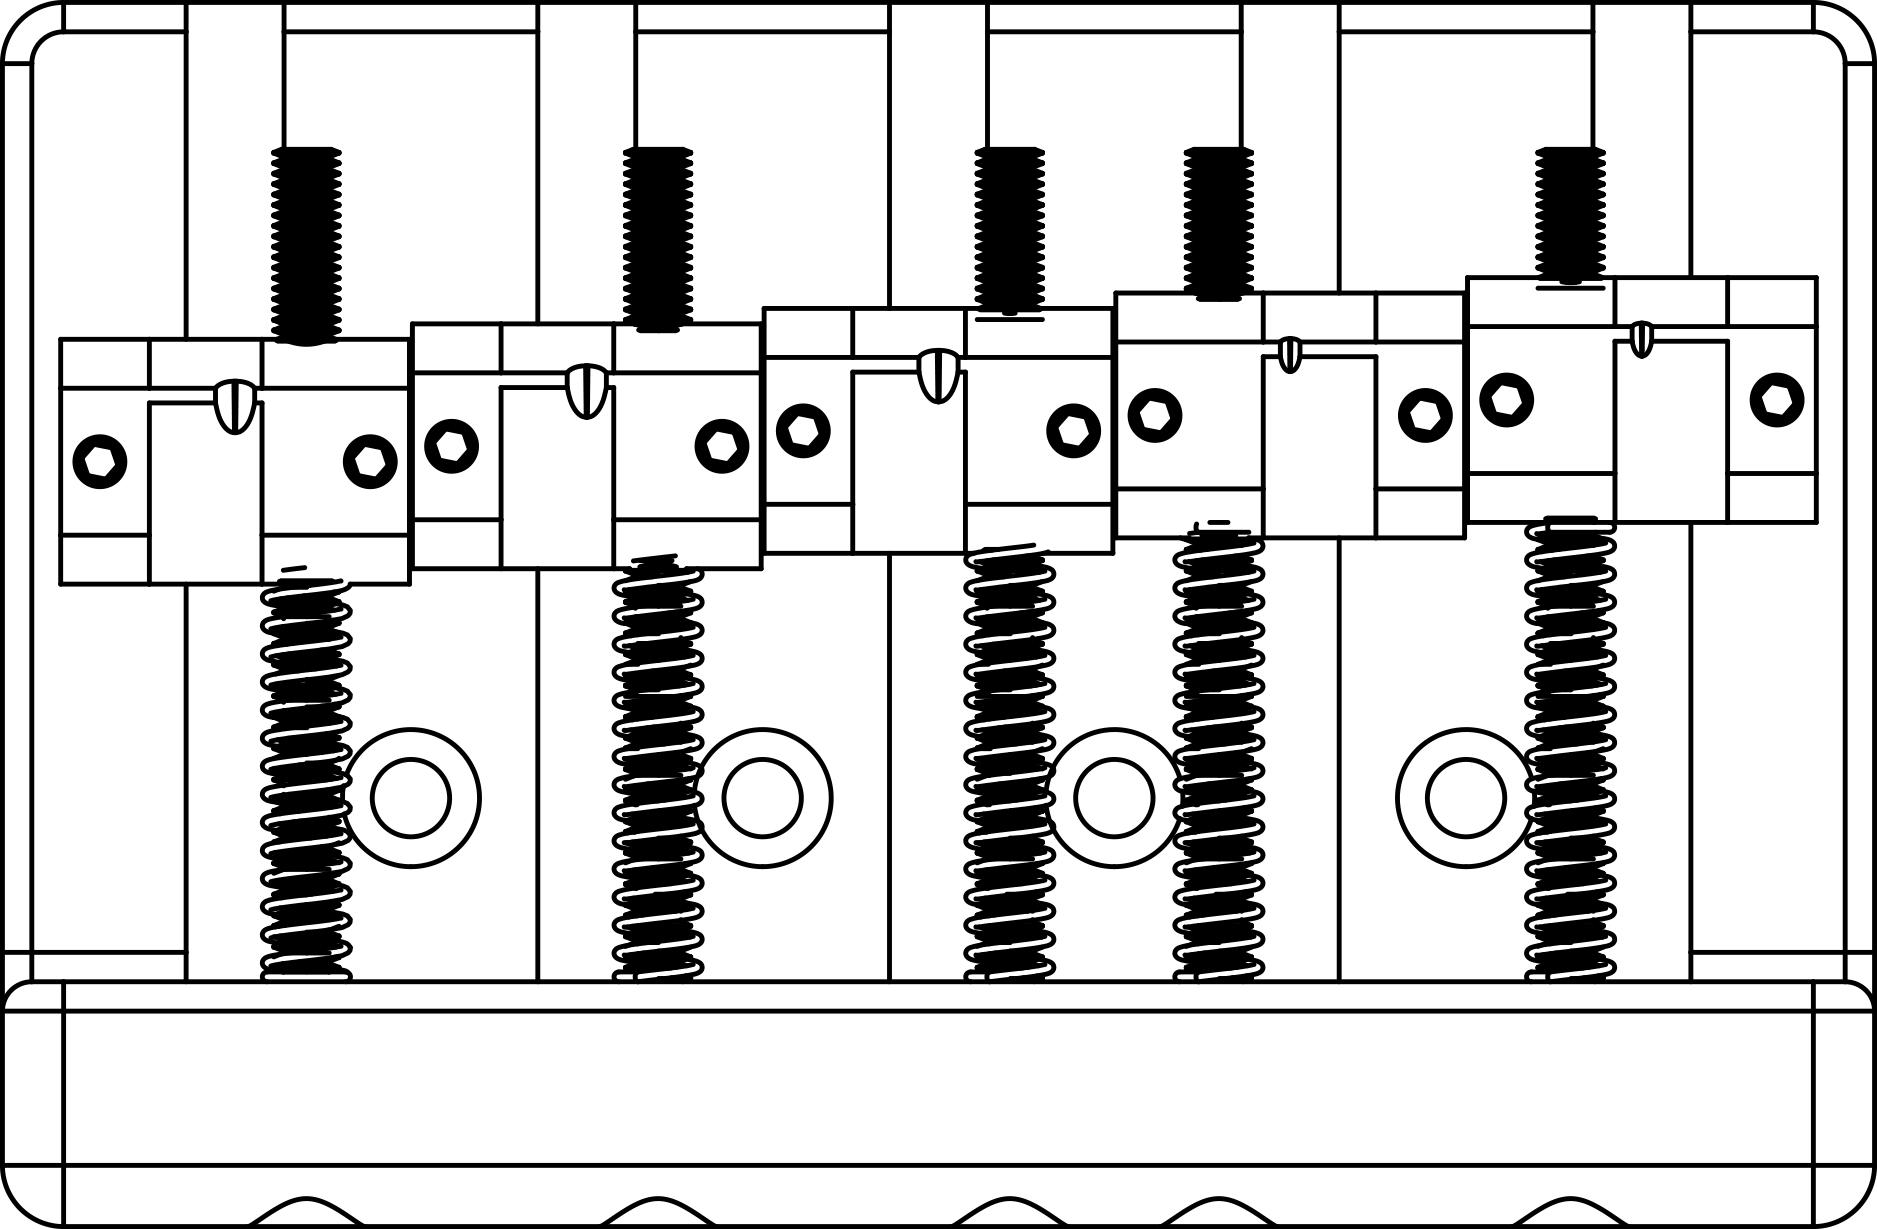 basses    x series signature david ellefson kelly u2122 bird v